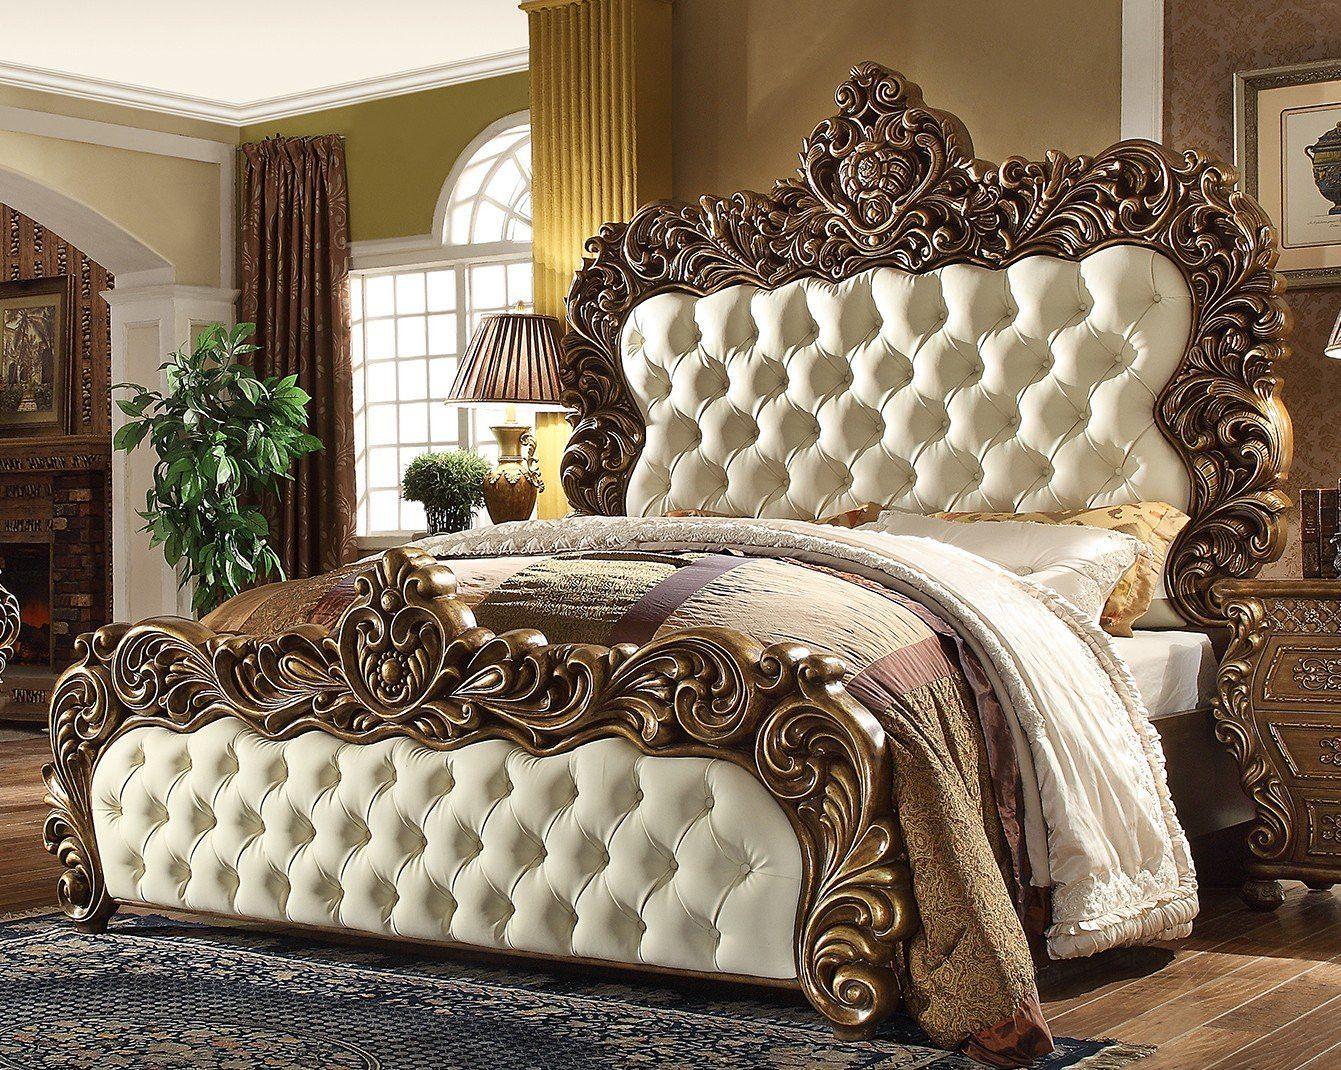 Homey Design Eastern King Bed Hd Description Rich